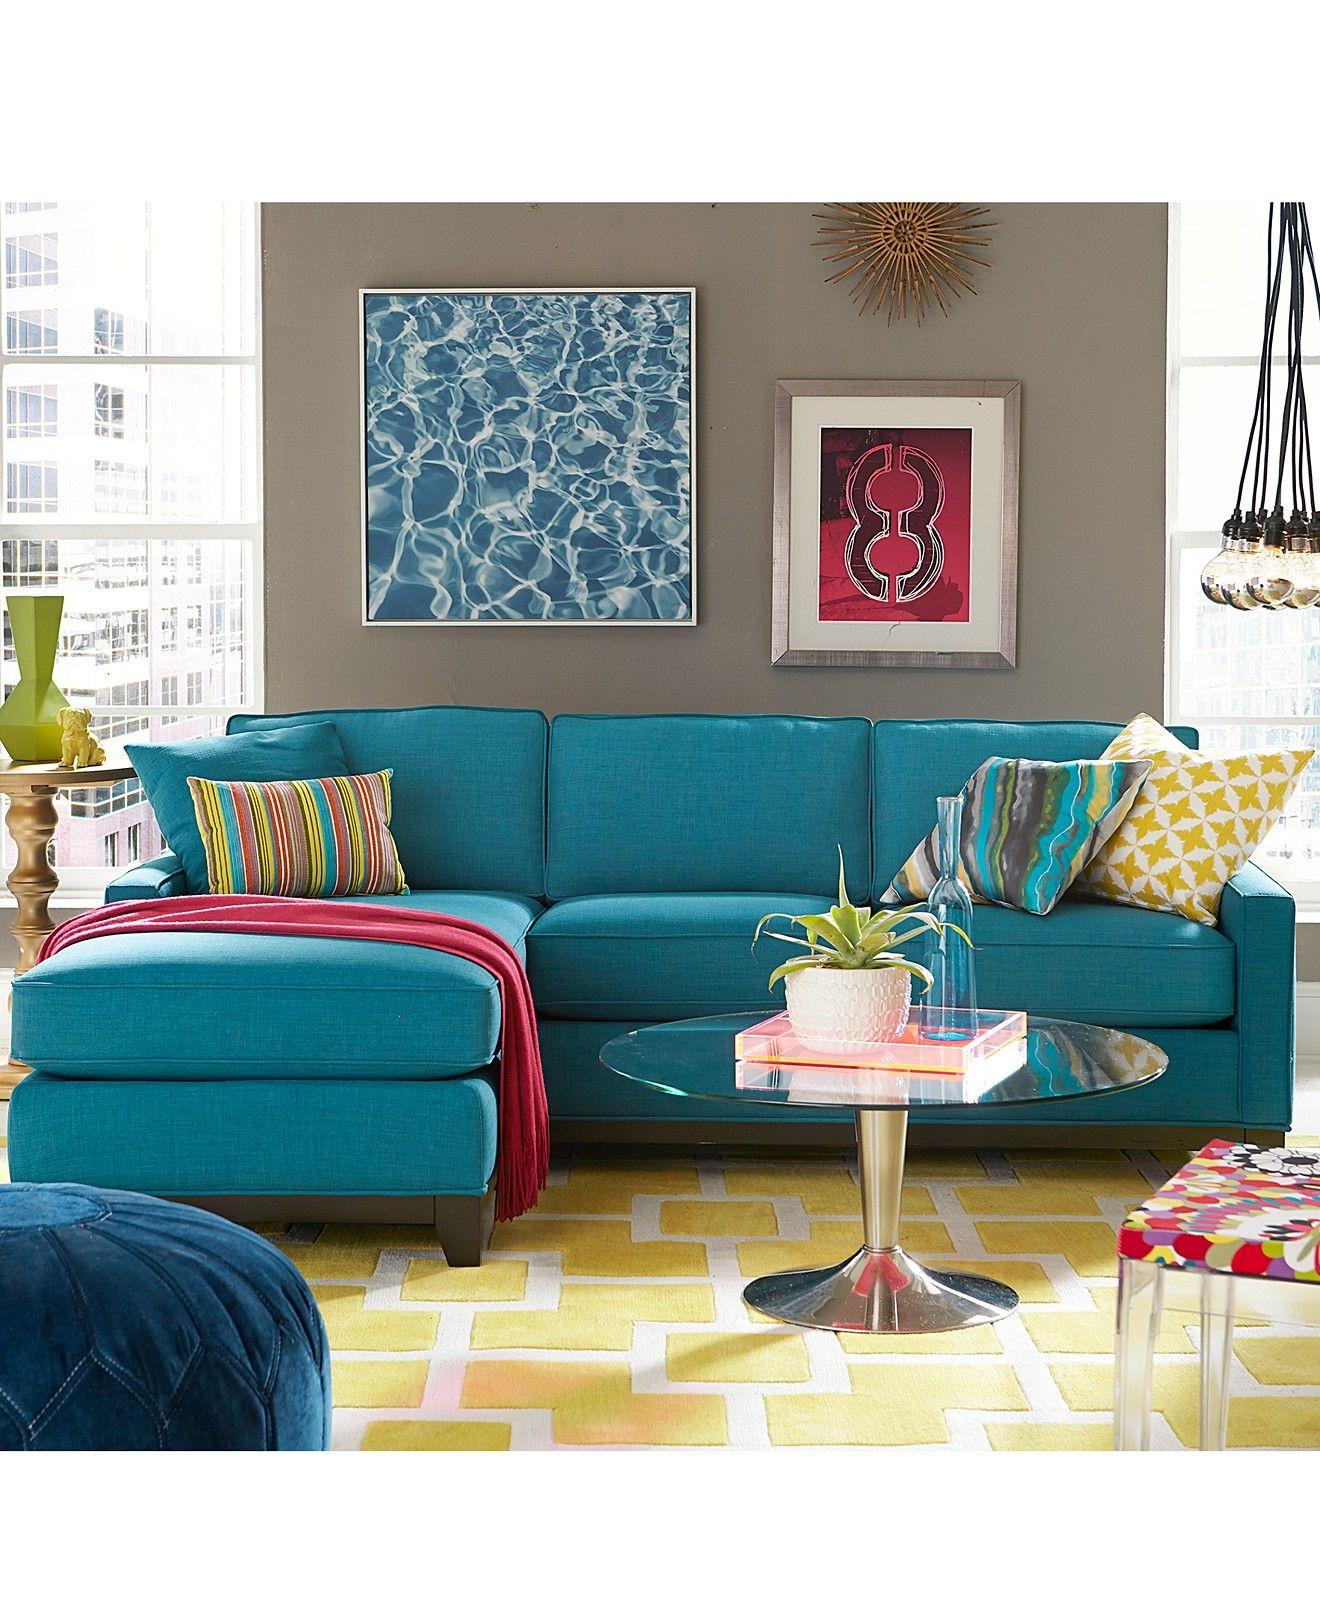 blue colour sofa set simmons harbortown reviews keegan fabric sectional living room furniture